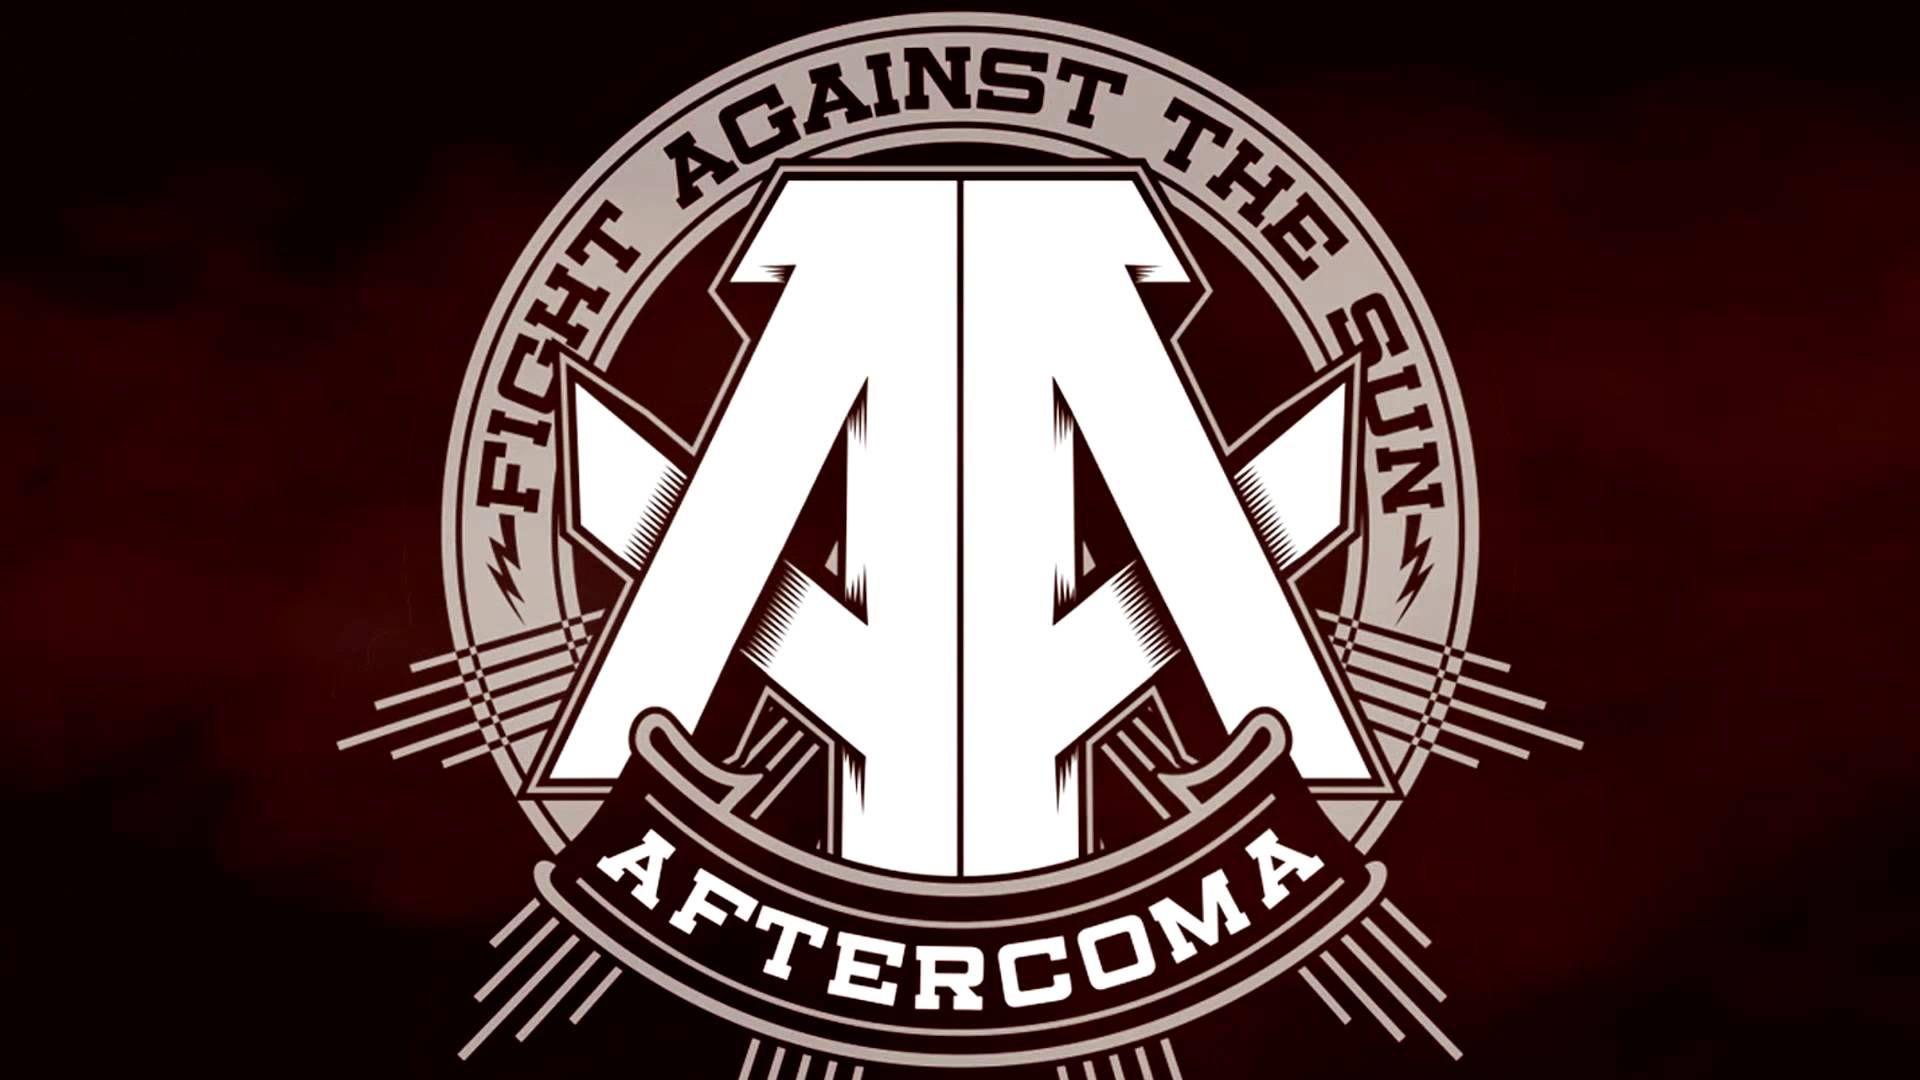 Aftercoma Perang Video Lirik Stuff To Buy